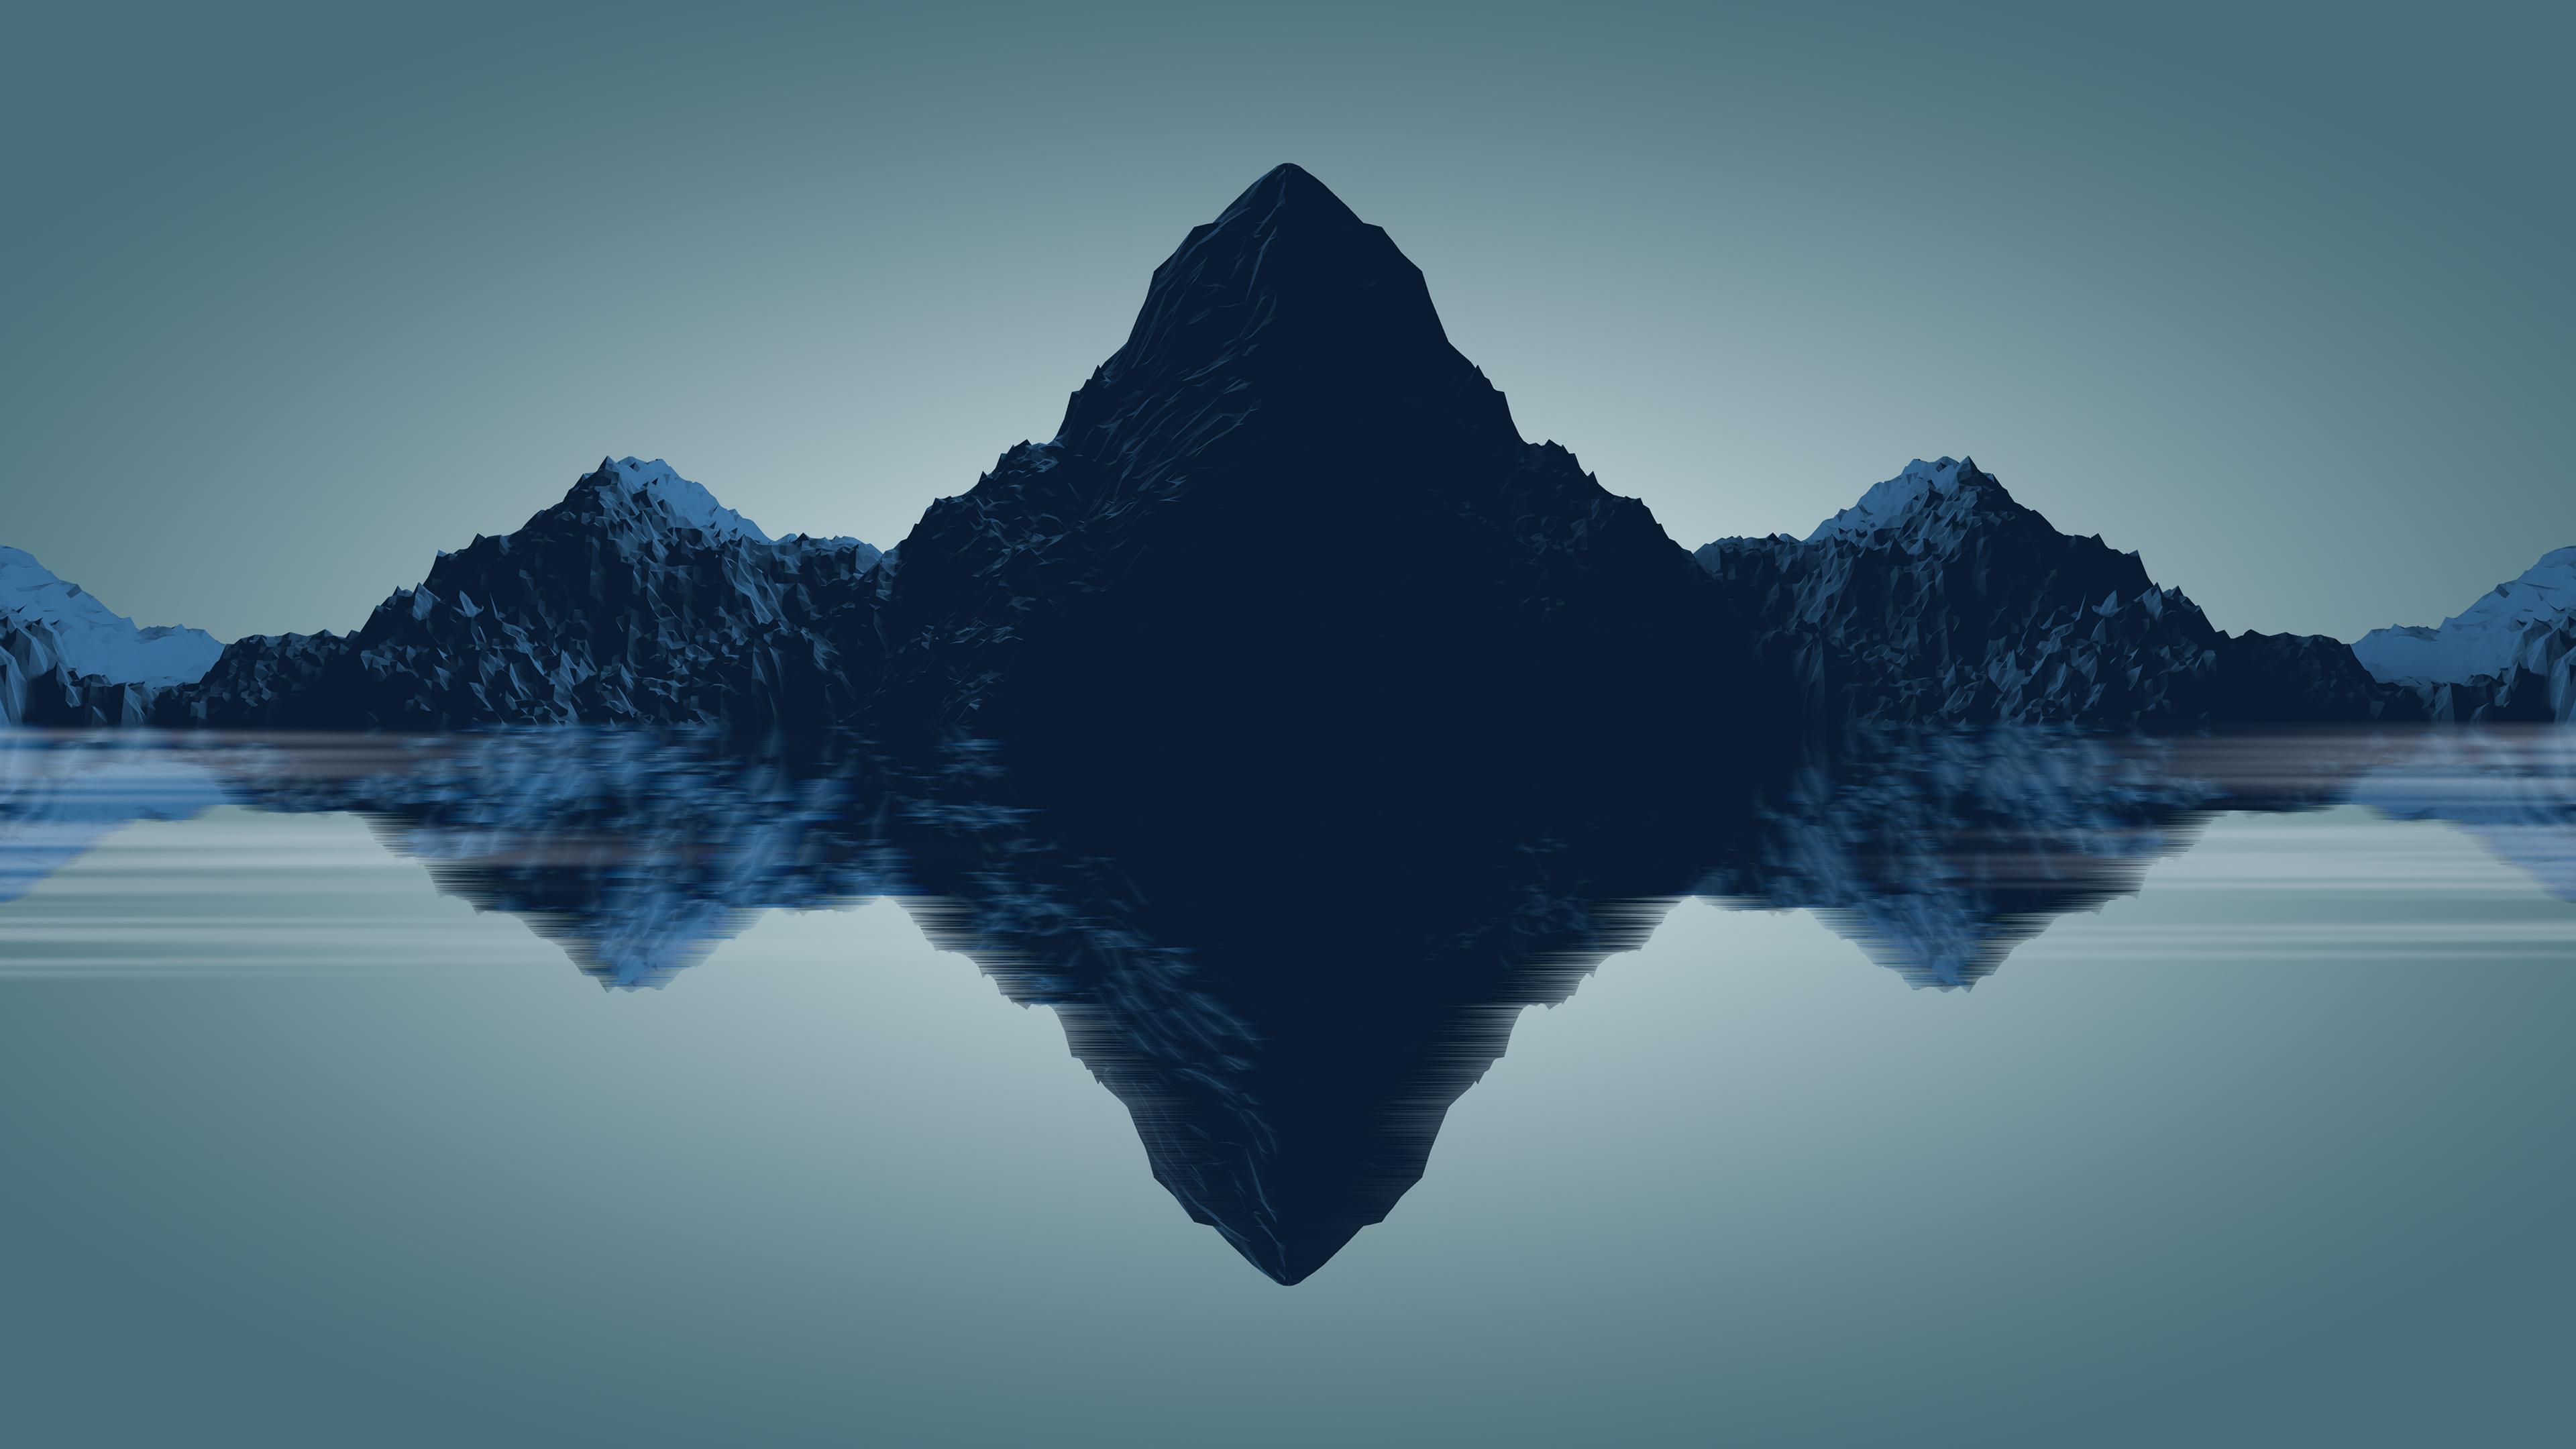 Minimal mountains hd 4k wallpaper for Define minimalist